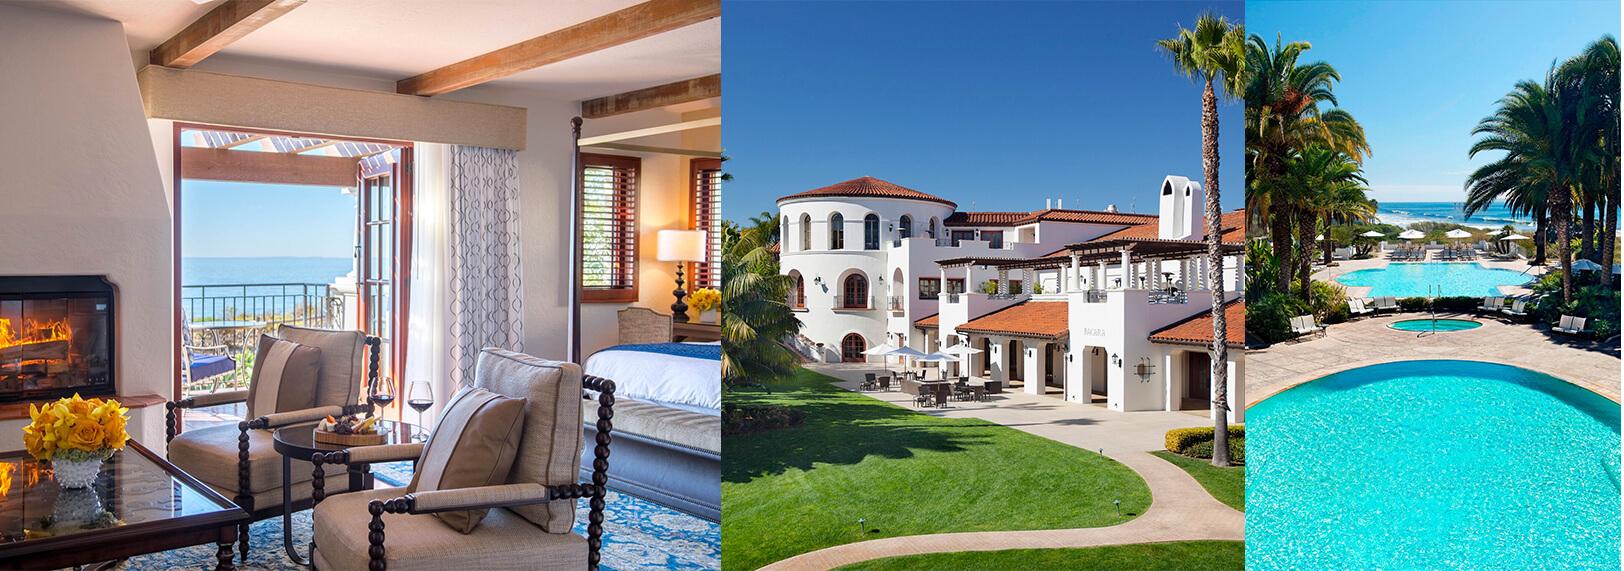 Ritz-Carlton Bacara in Santa Barbara California